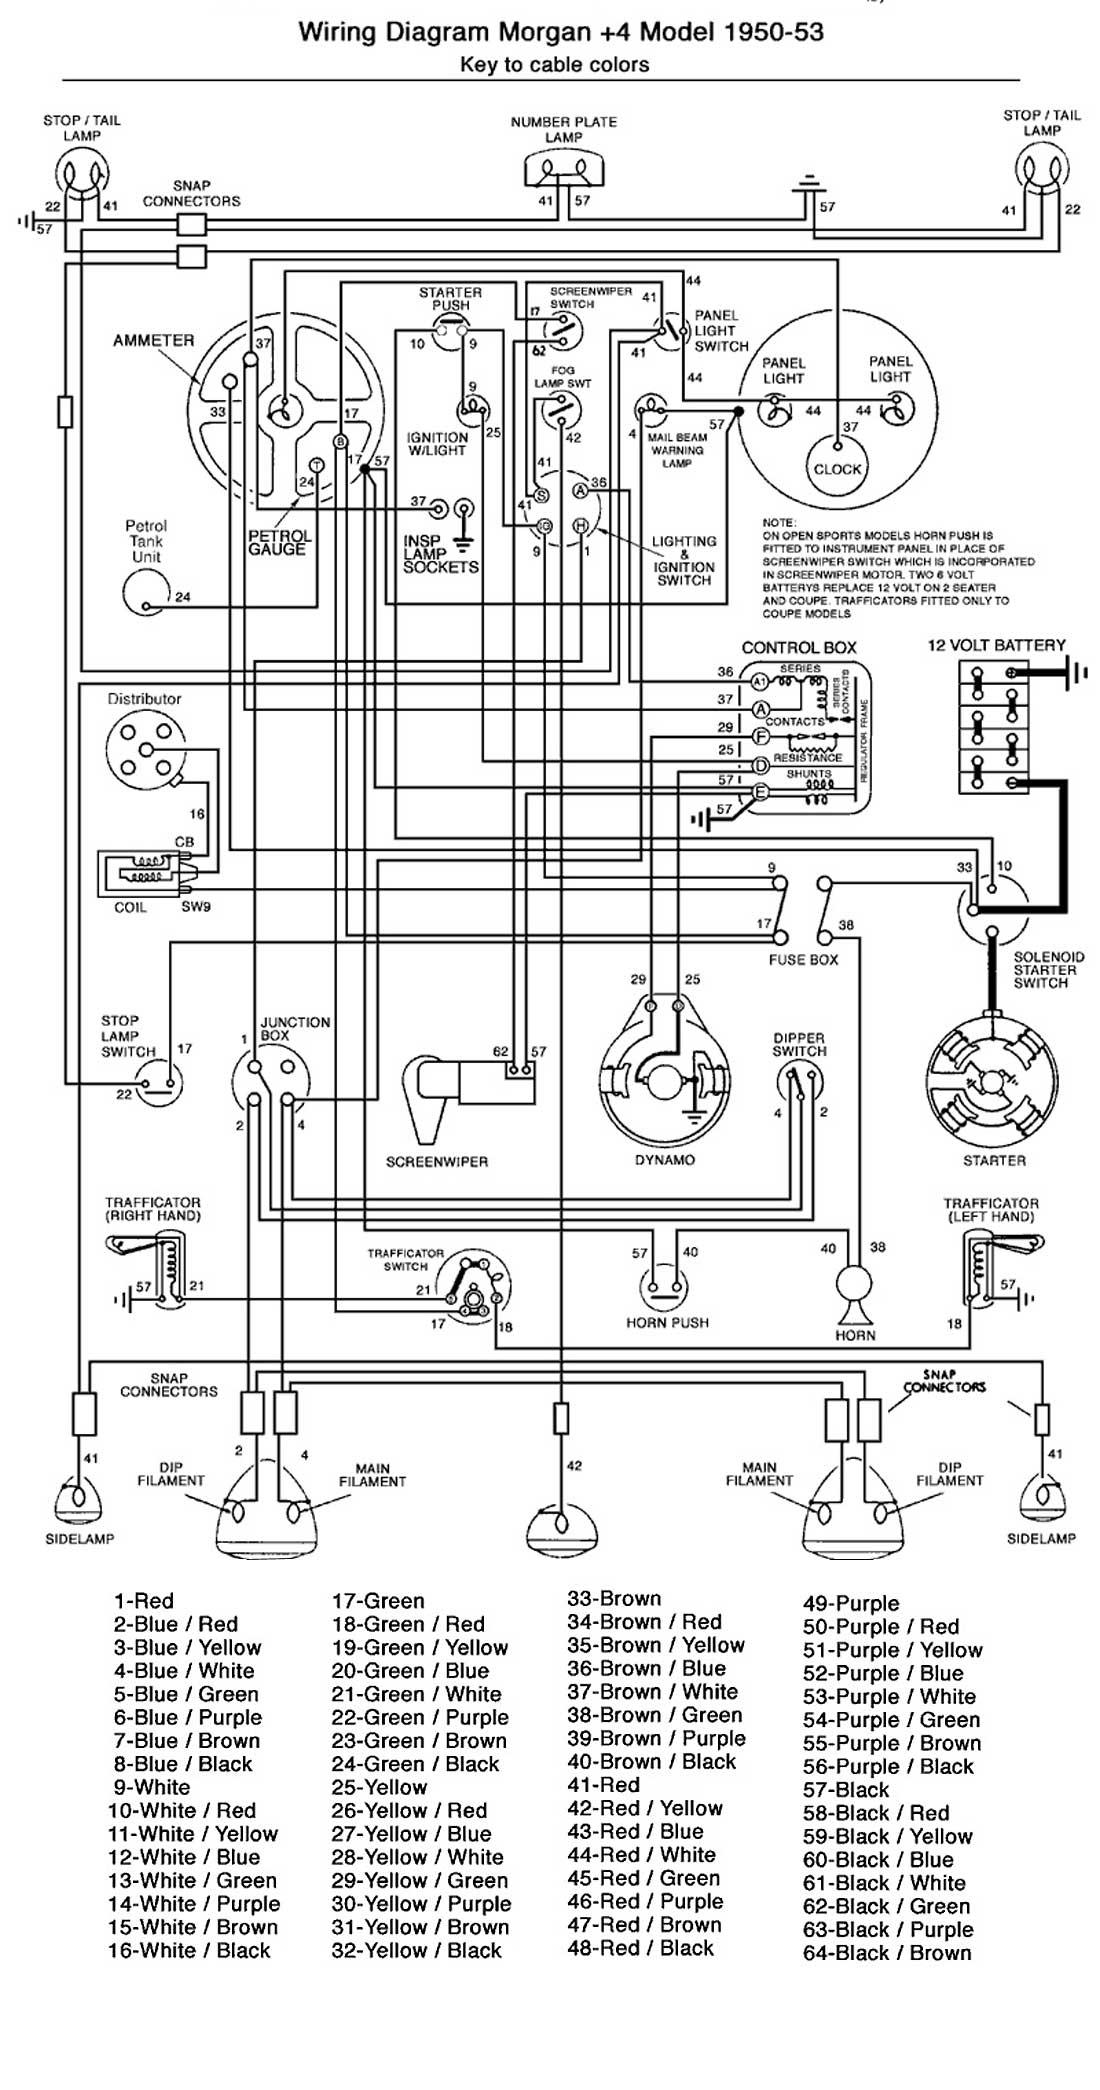 cove spa wiring diagram